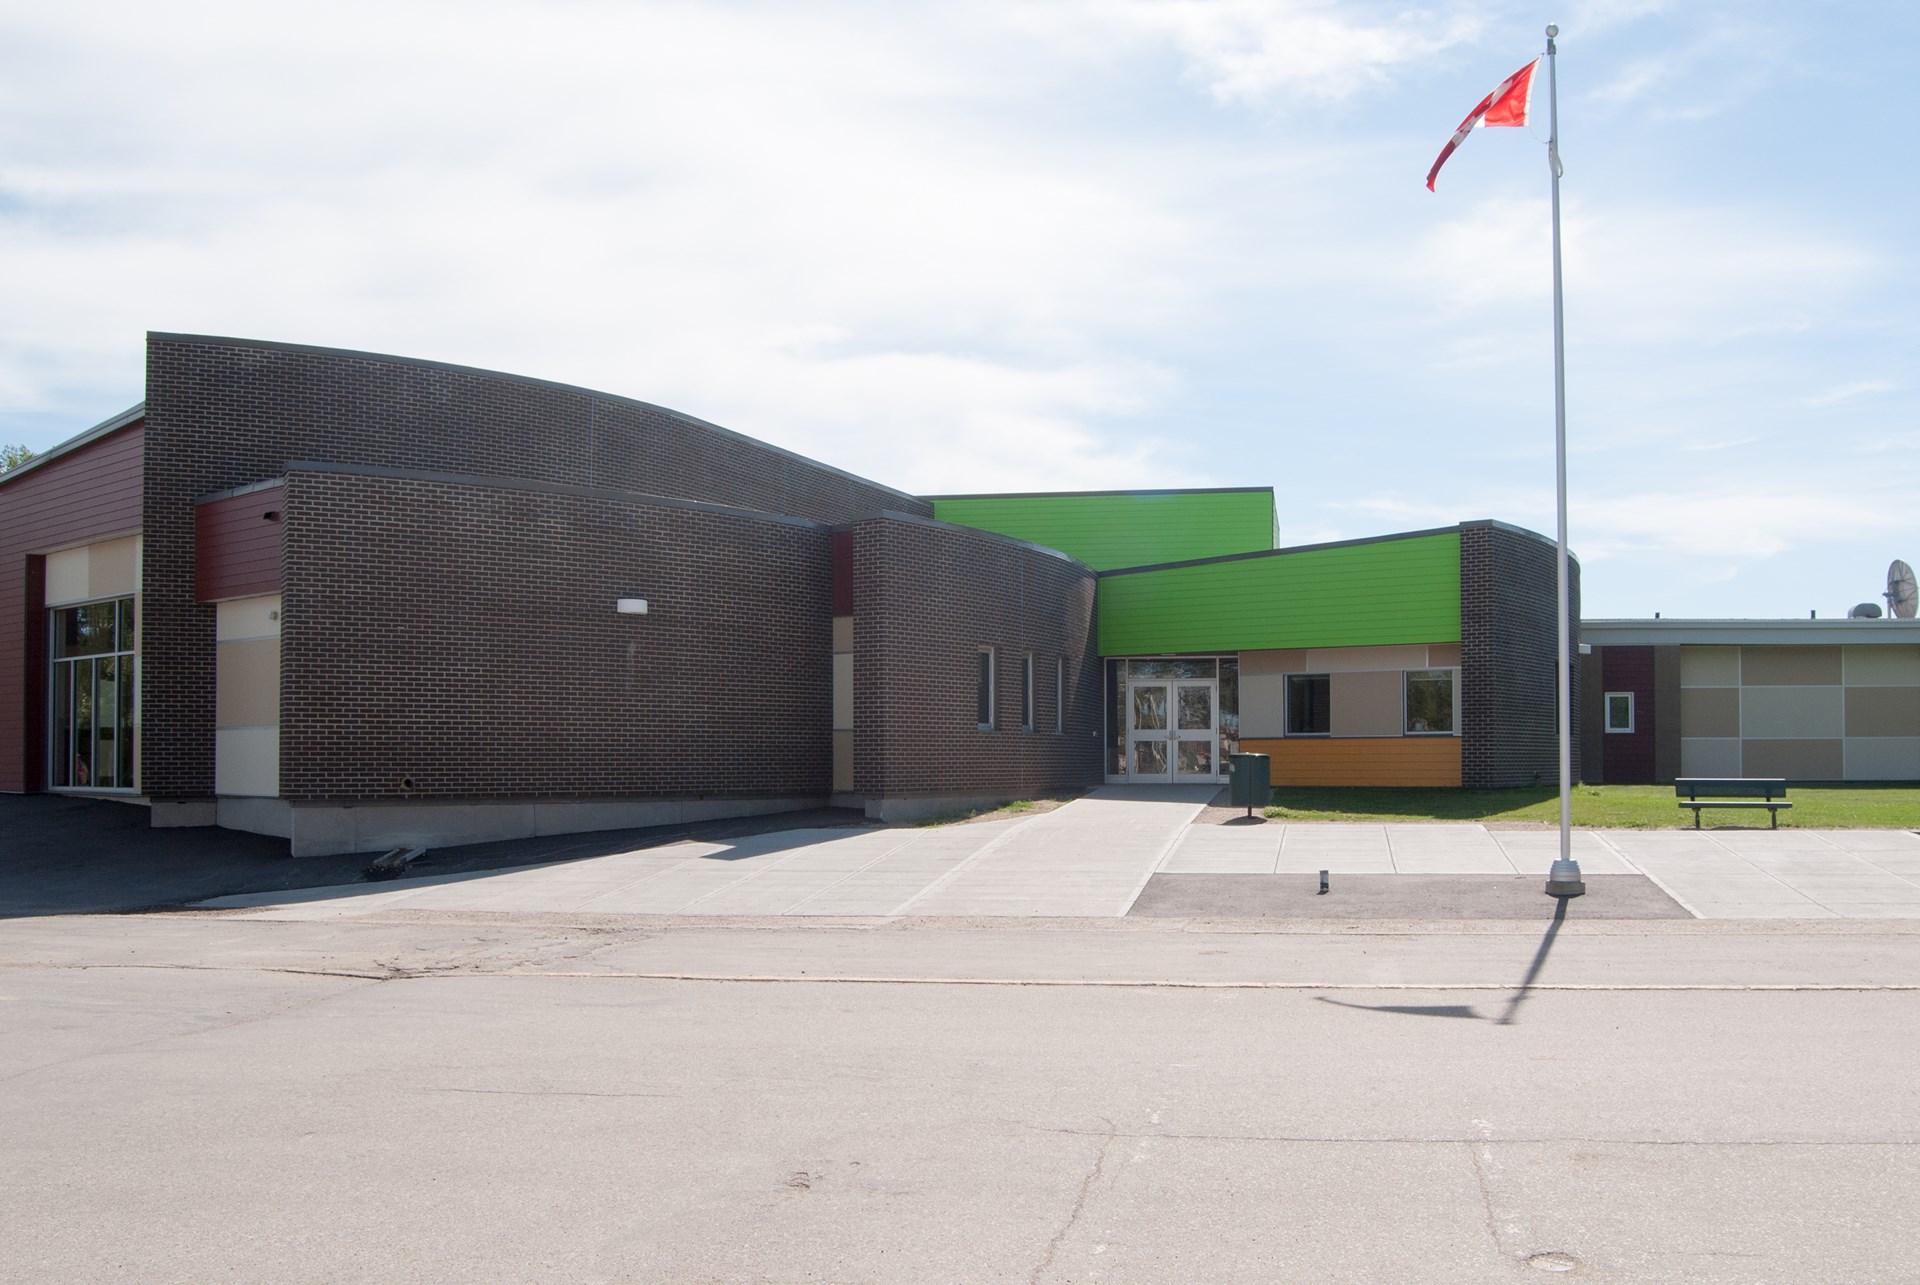 Kipling School